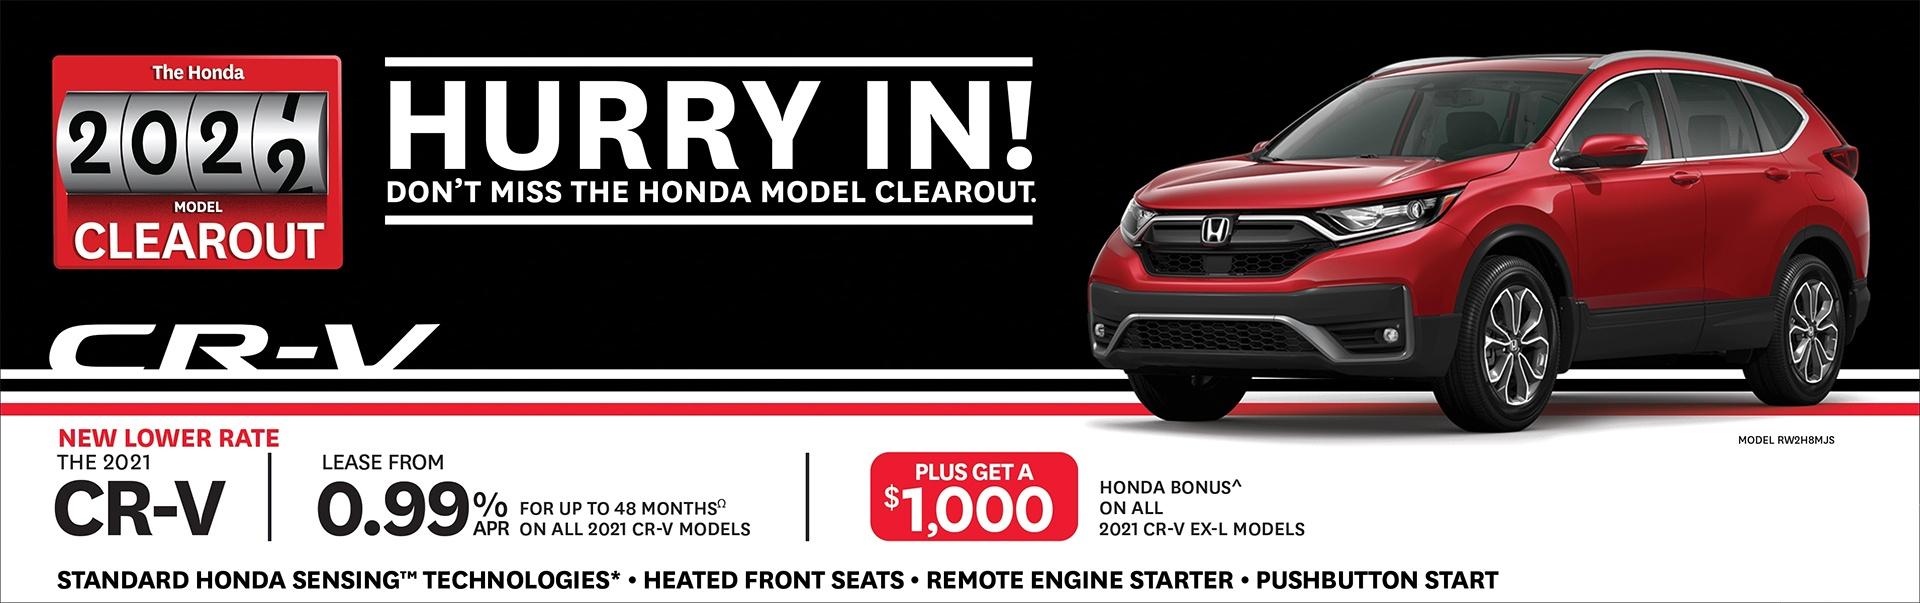 Honda-Clearout-21CRV-Carousel